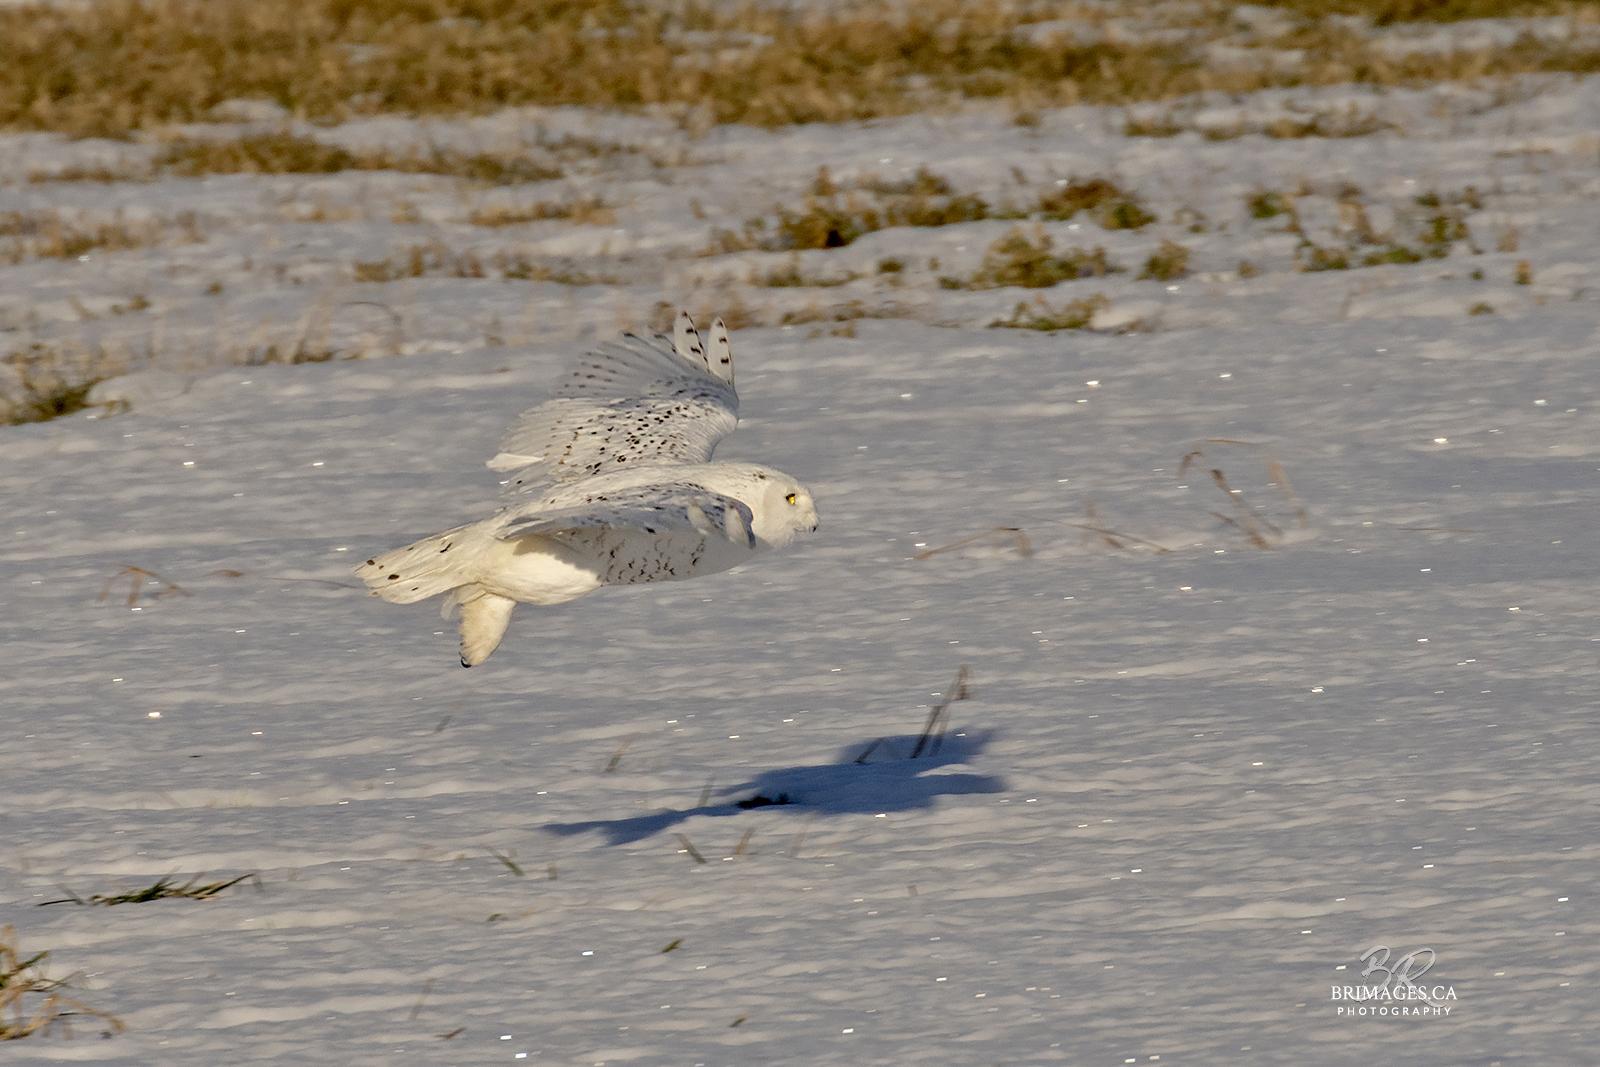 snowy-owl-in-flight-new-brunswick-5-BRimages.ca